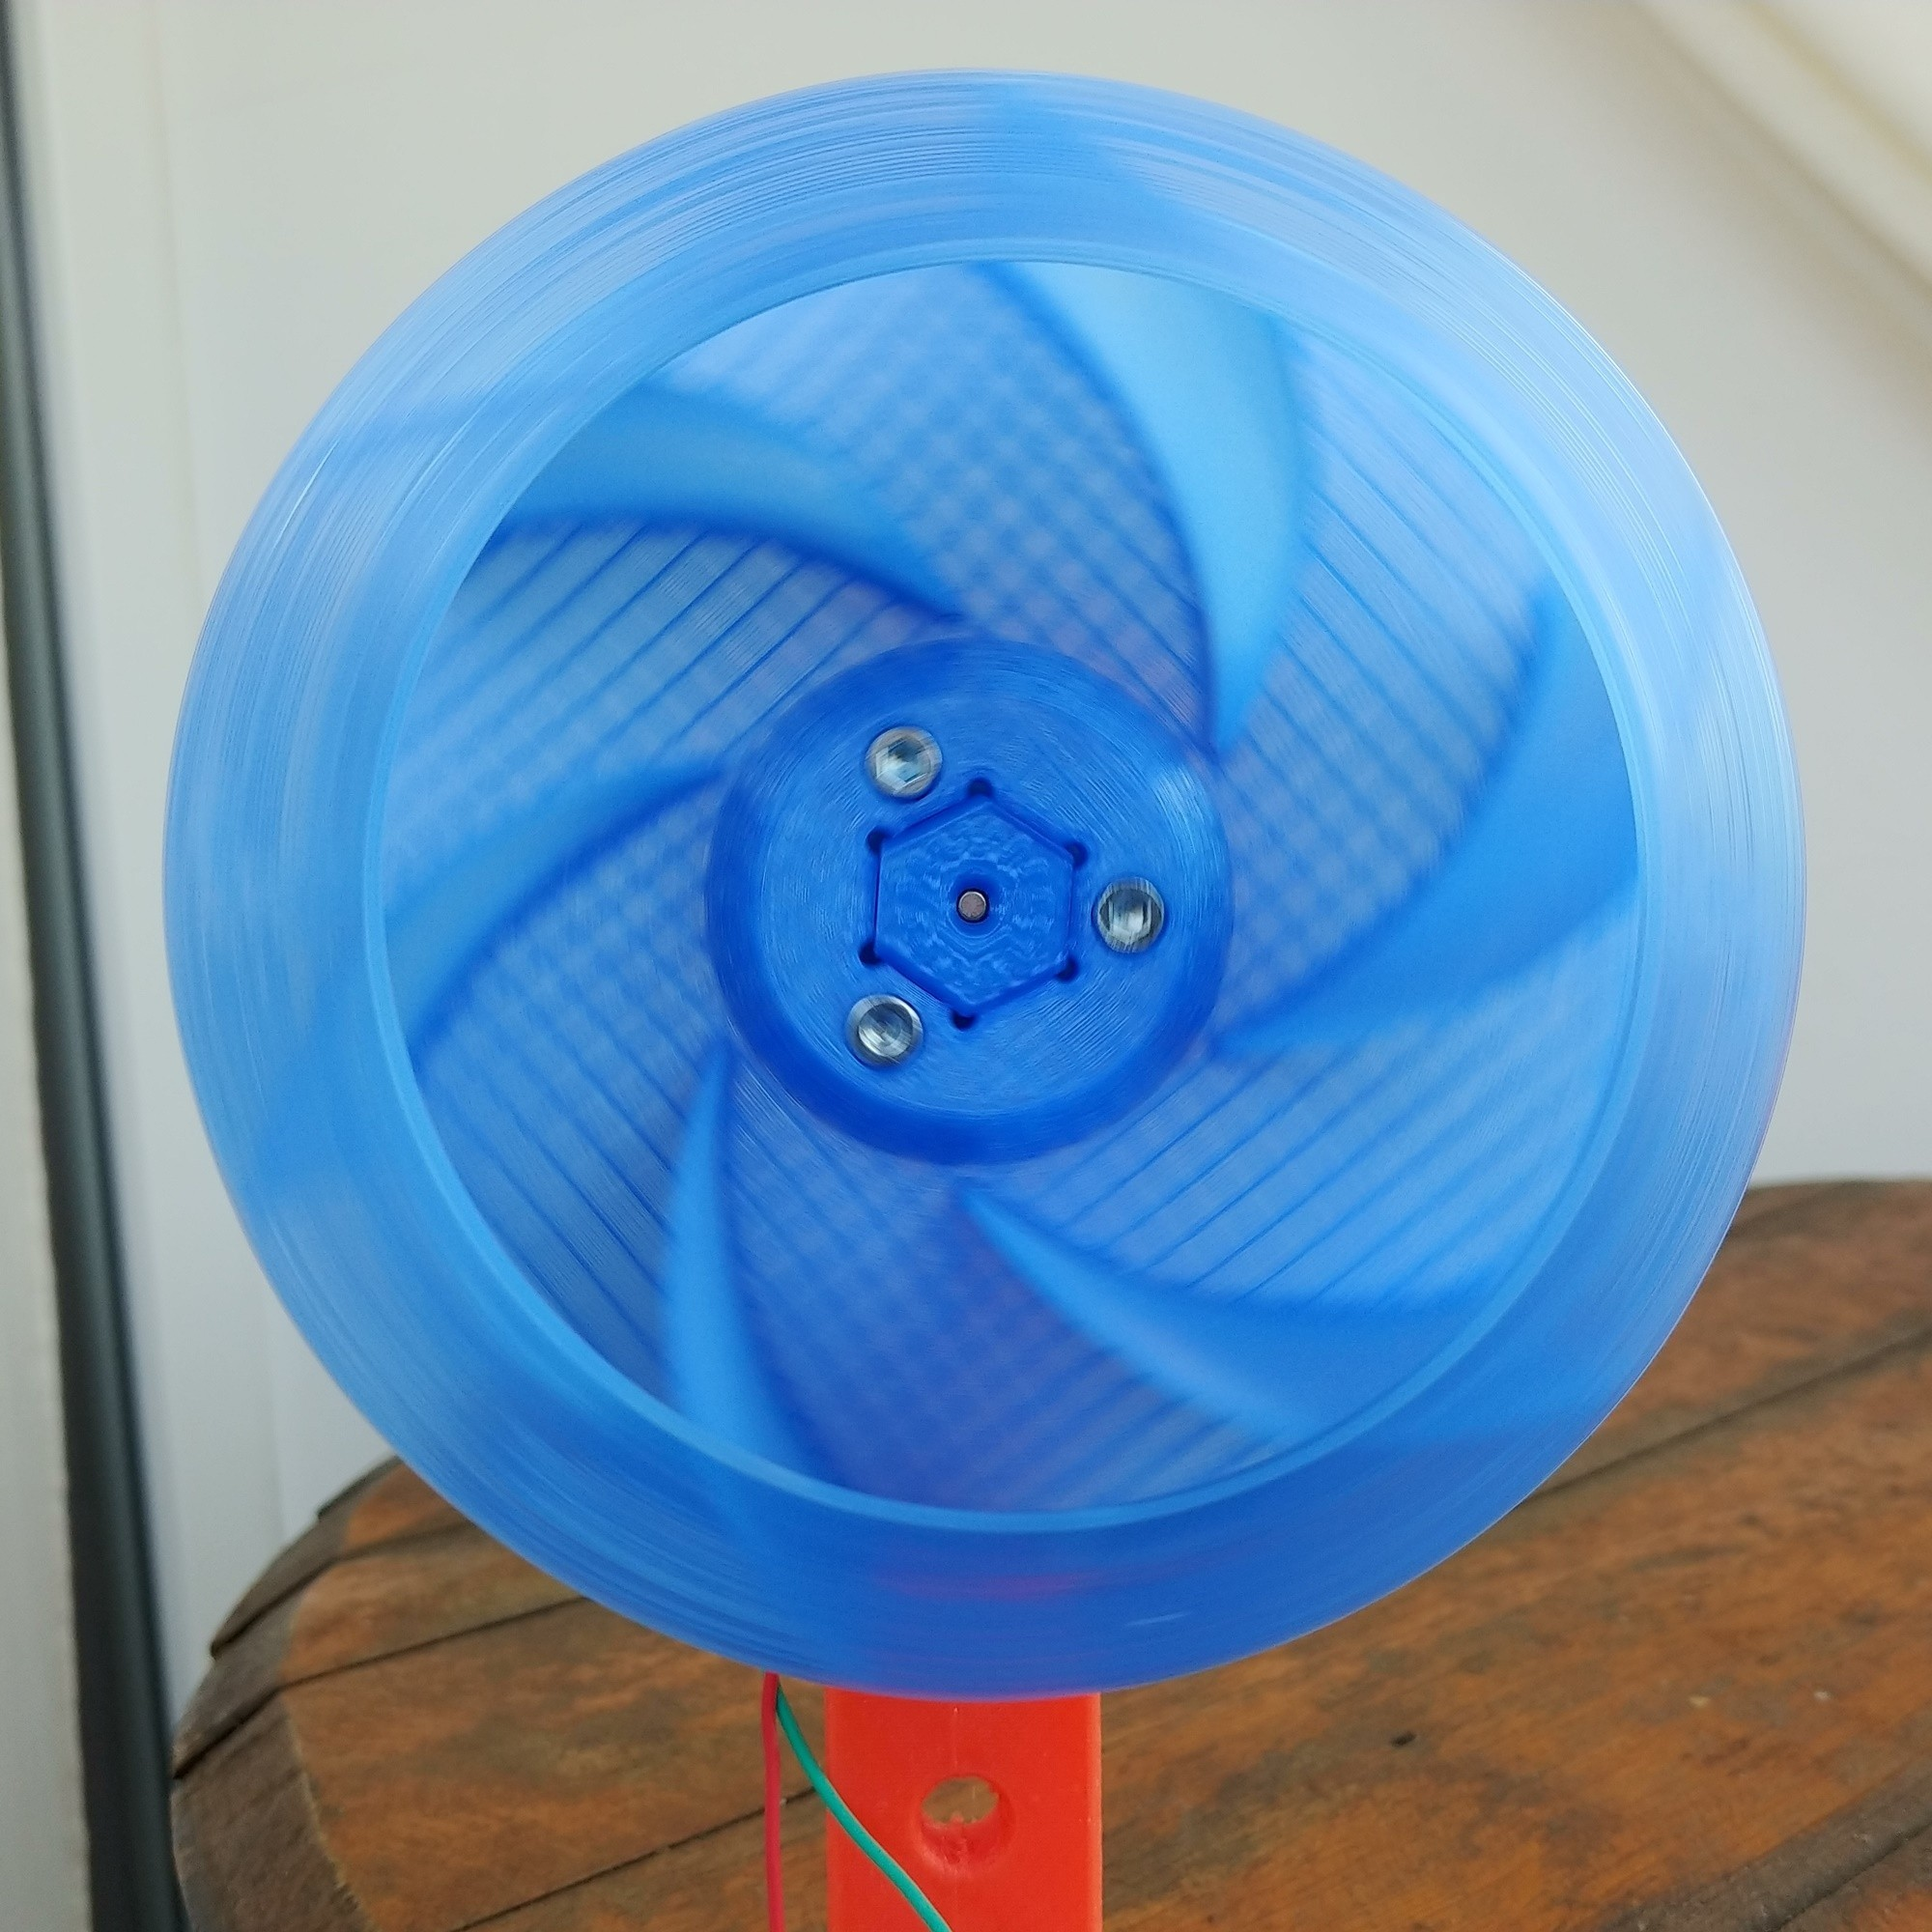 01 1-1.jpg Download free STL file Radial Fan Impeller / Radialventilator Laufrad - 125RL-6X • 3D printable template, CONSTRUCTeR